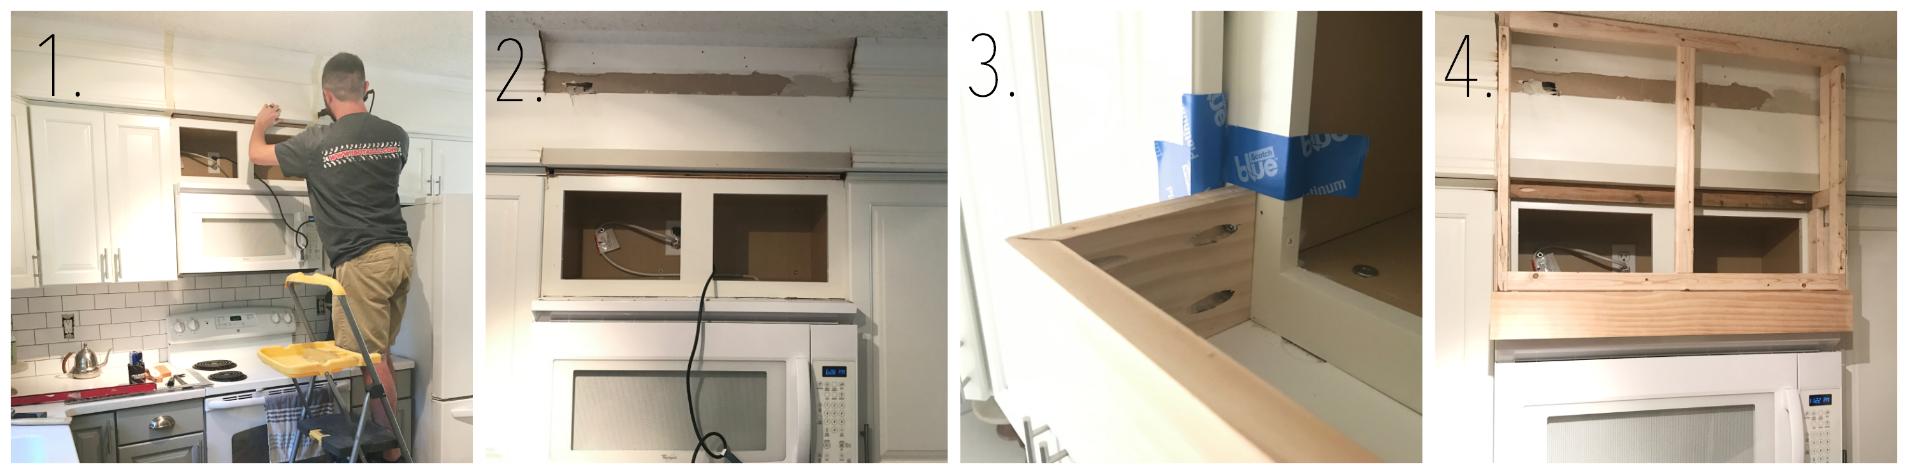 Custom Hood DIY Above Microwave